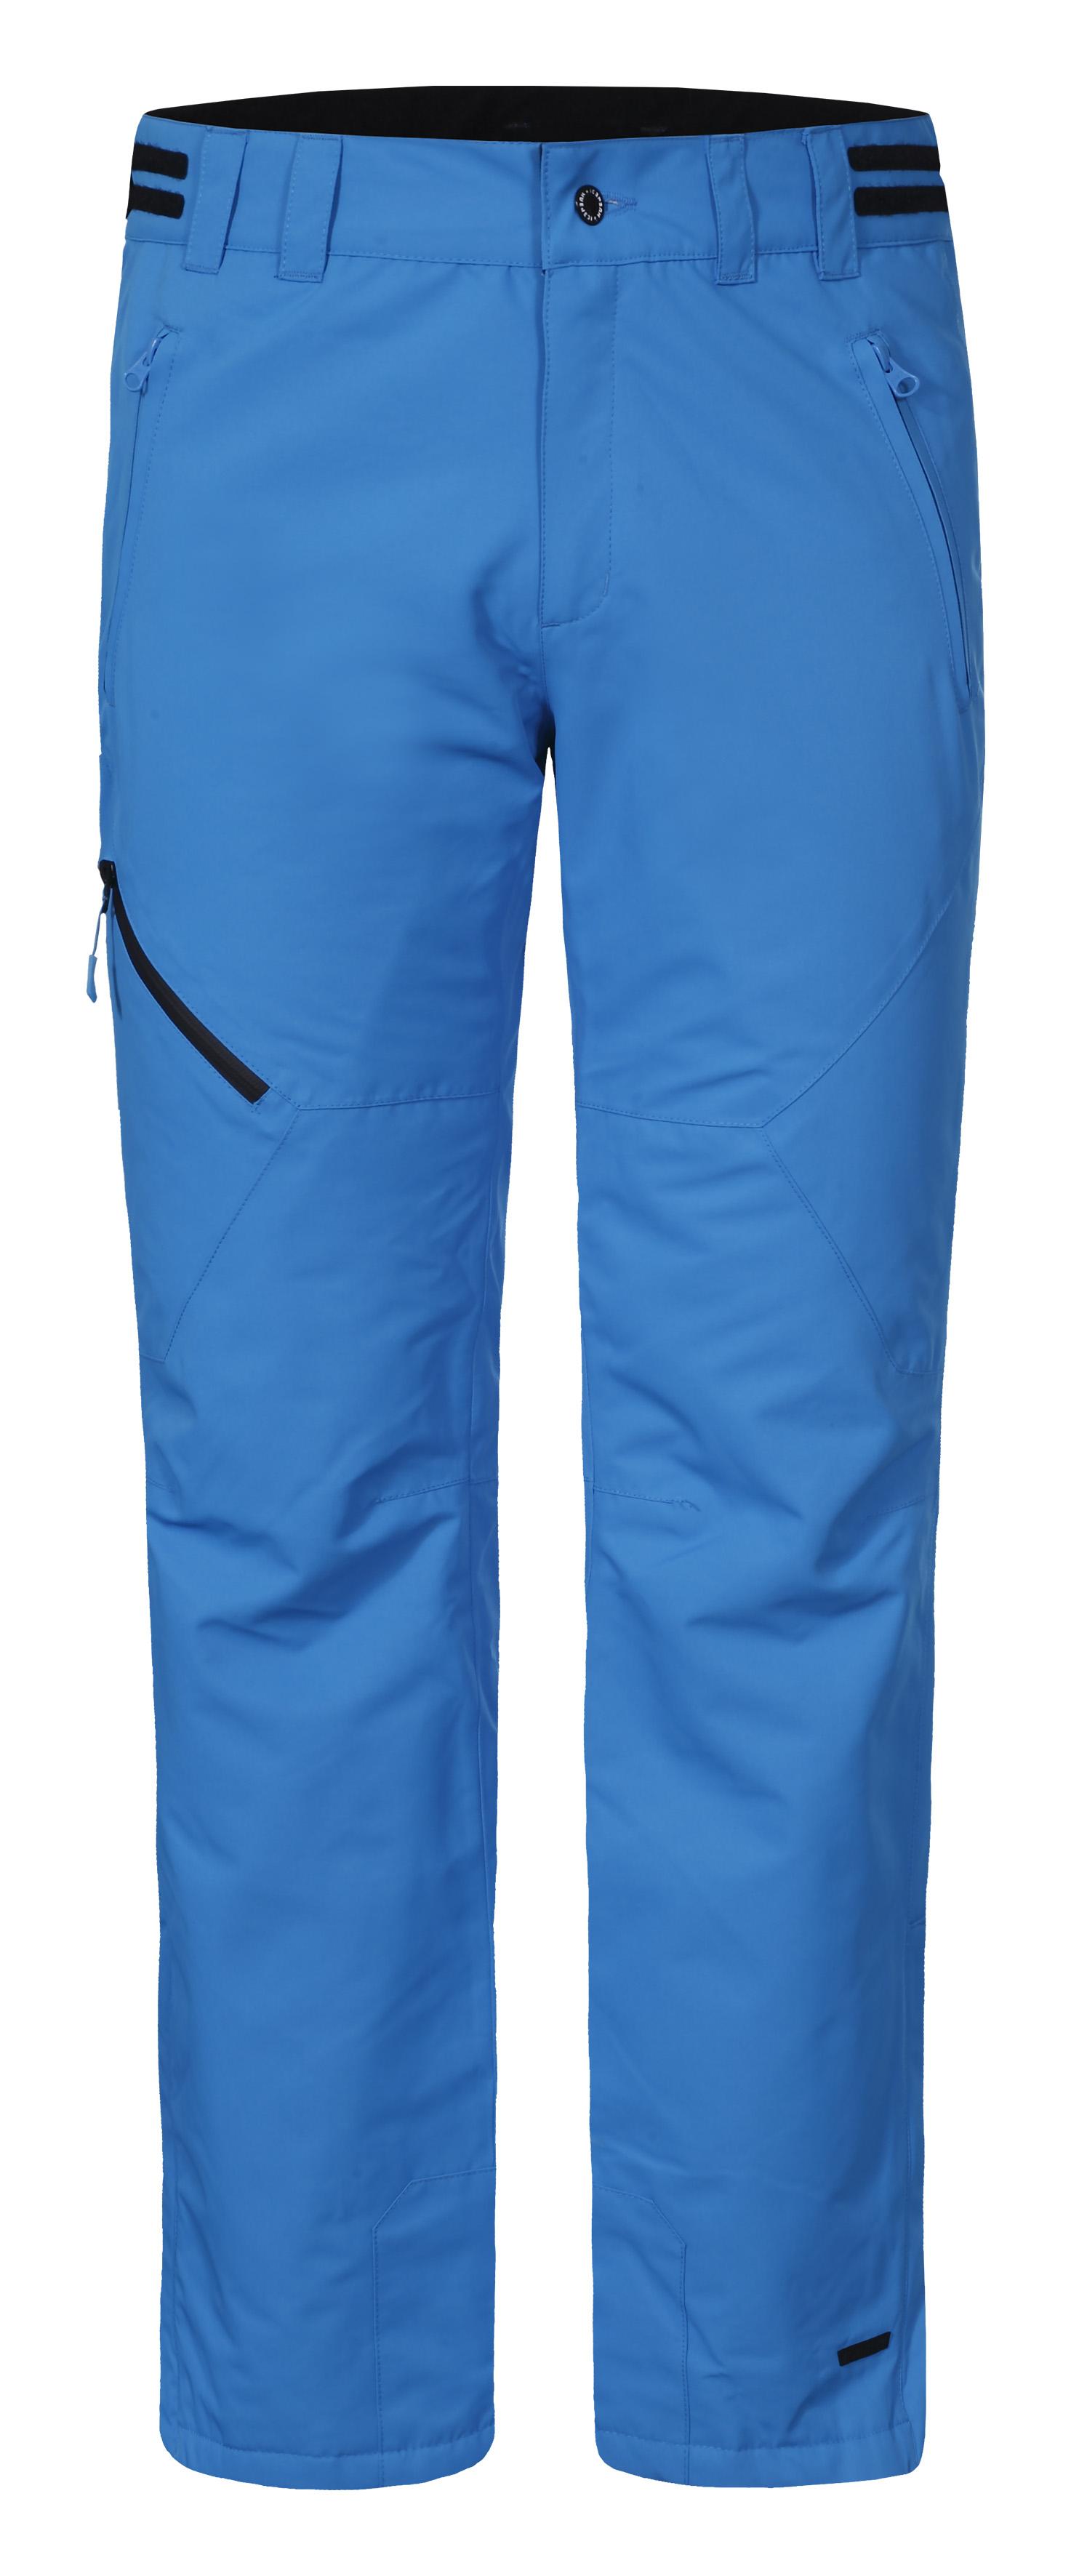 Image of   Icepeak Johnny Wadded Trousers men - Turquoise